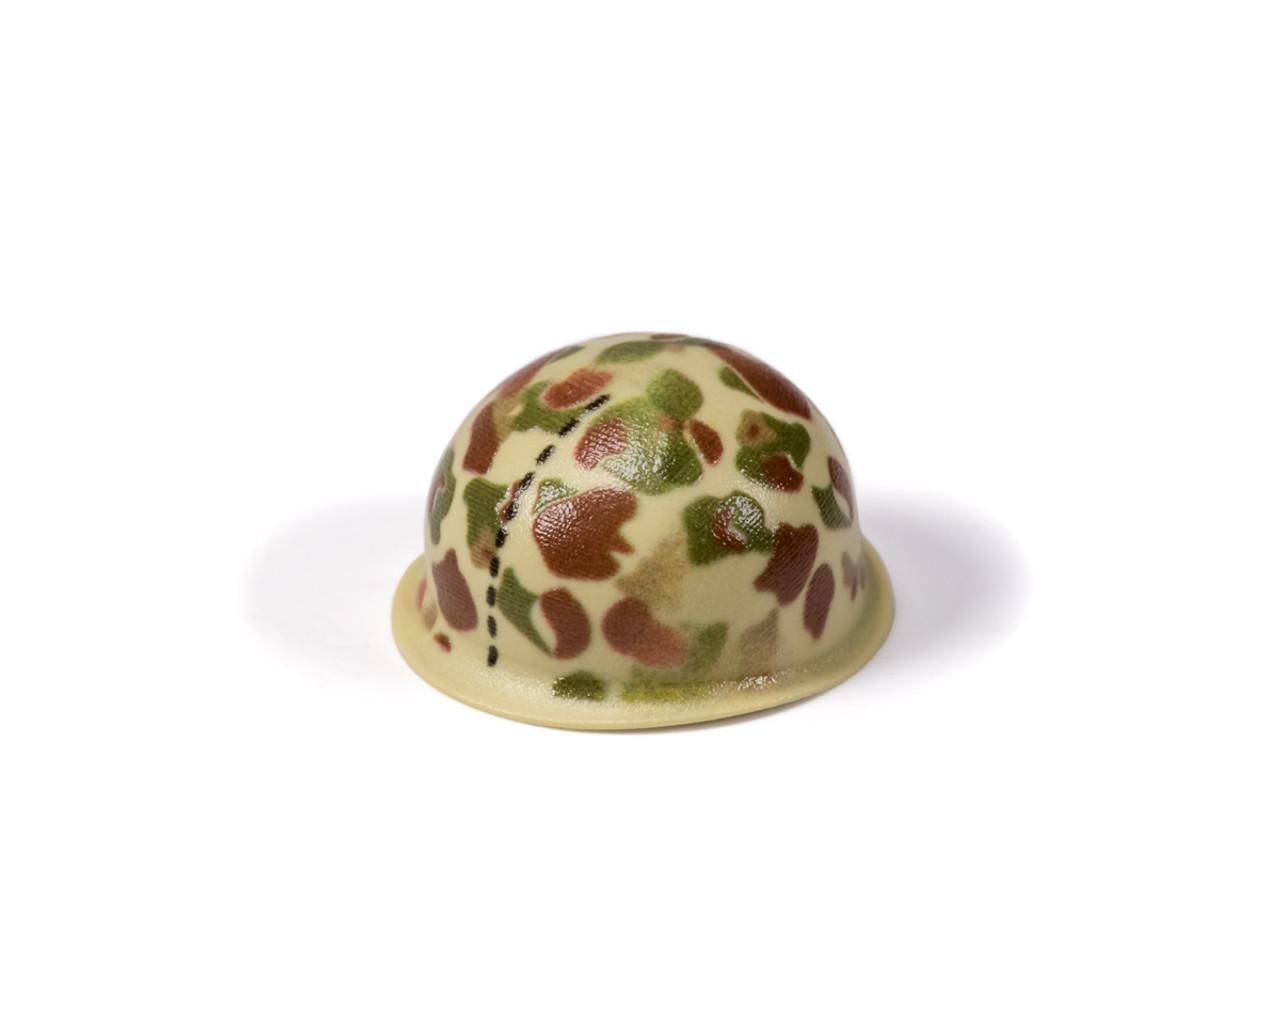 M1 Steel Pot Helmet - WWII US Marines Frog Skin Camouflage